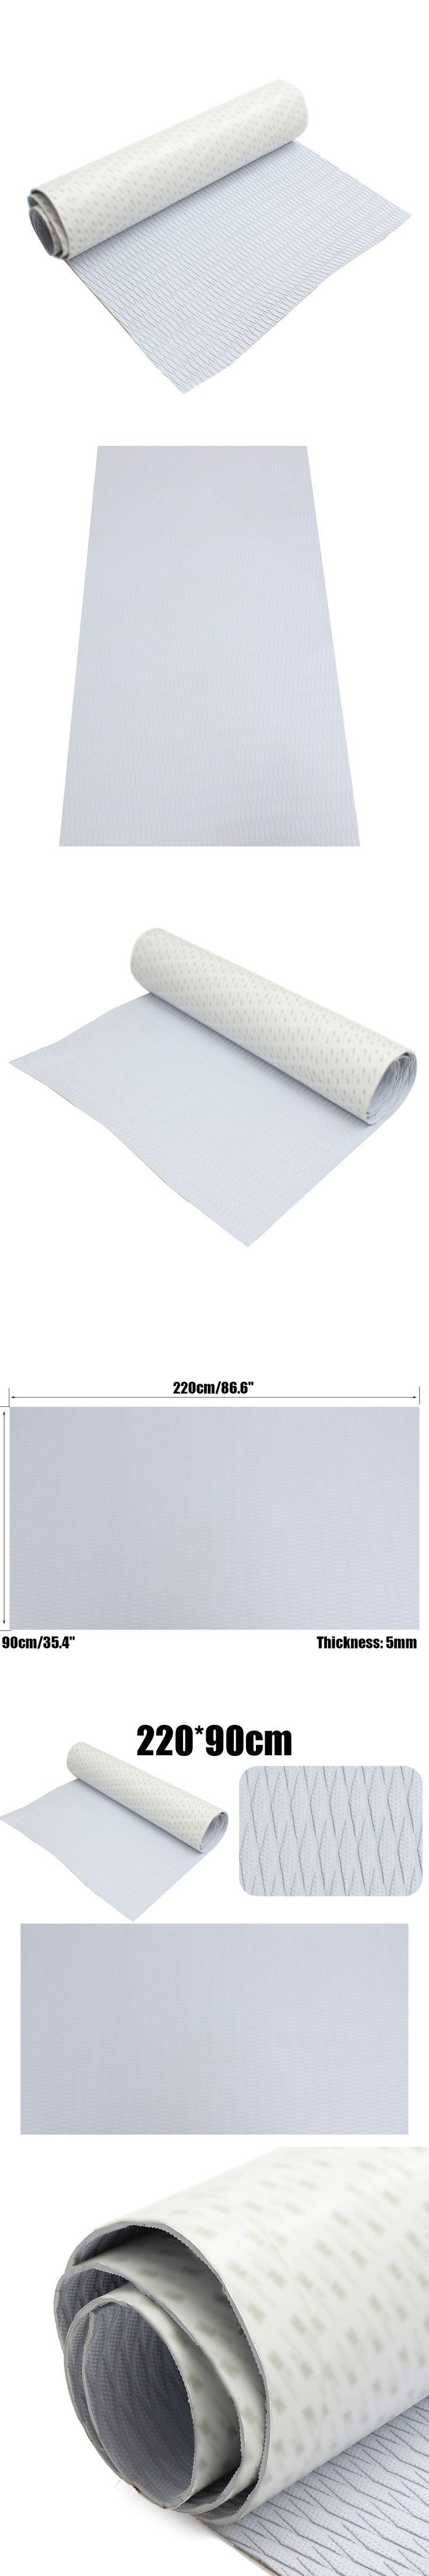 New 5mm 220cm x 90cm Self-Adhesive EVA Foam RV Boat Decking Sheet Marine Flooring Faux Teak Grey